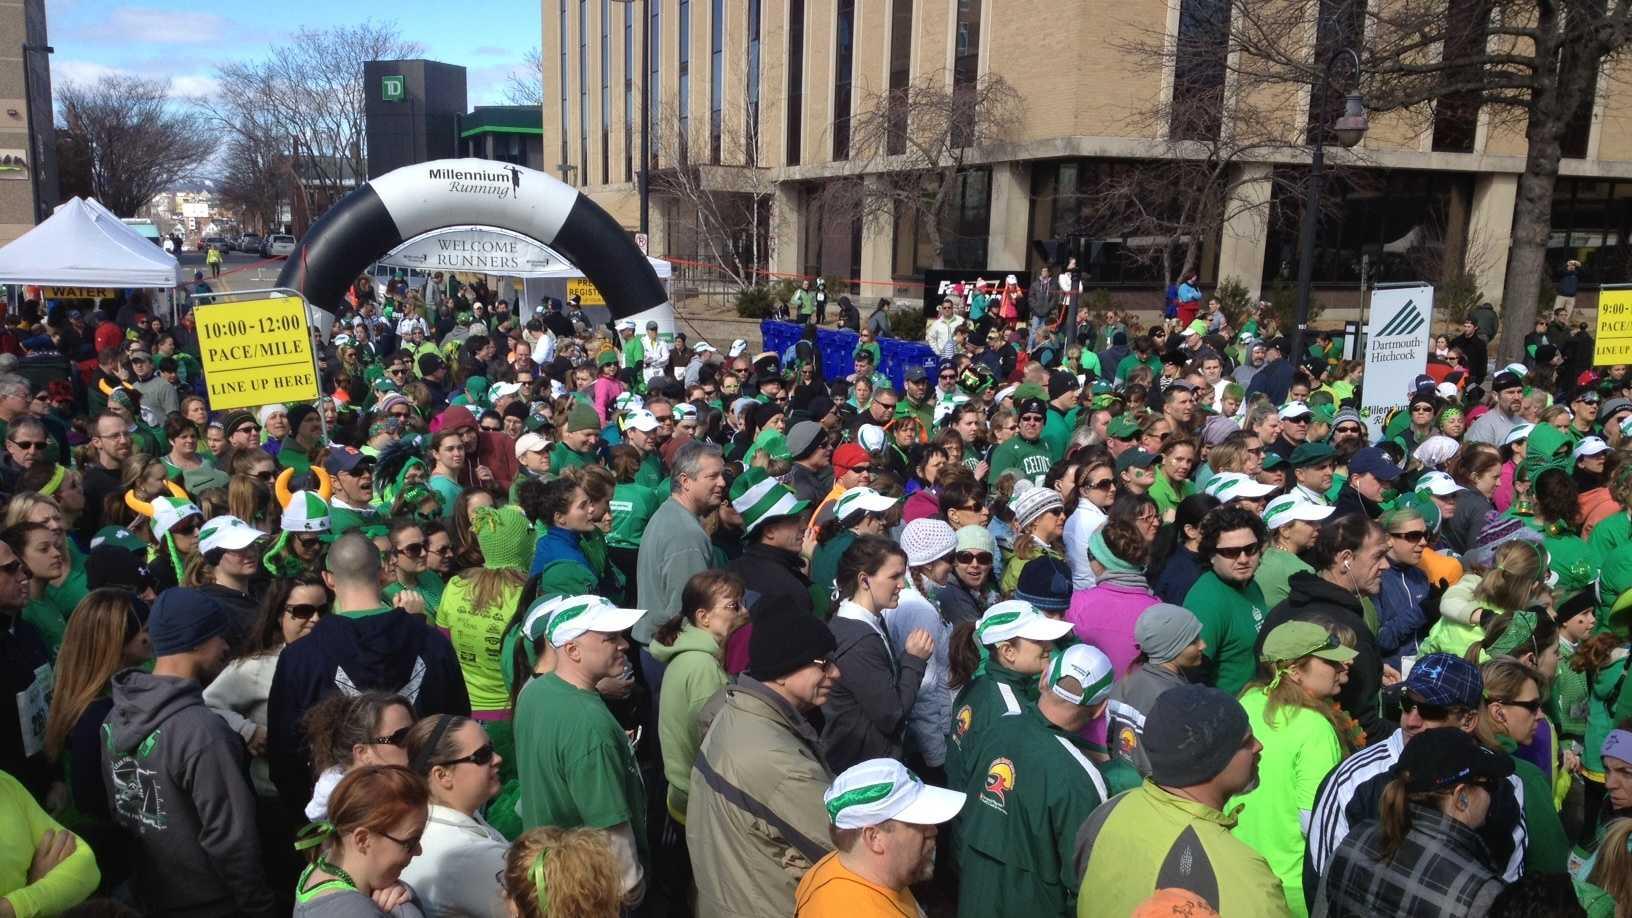 Manchester hosts St. Patrick's parade and Shamrock Shuffle